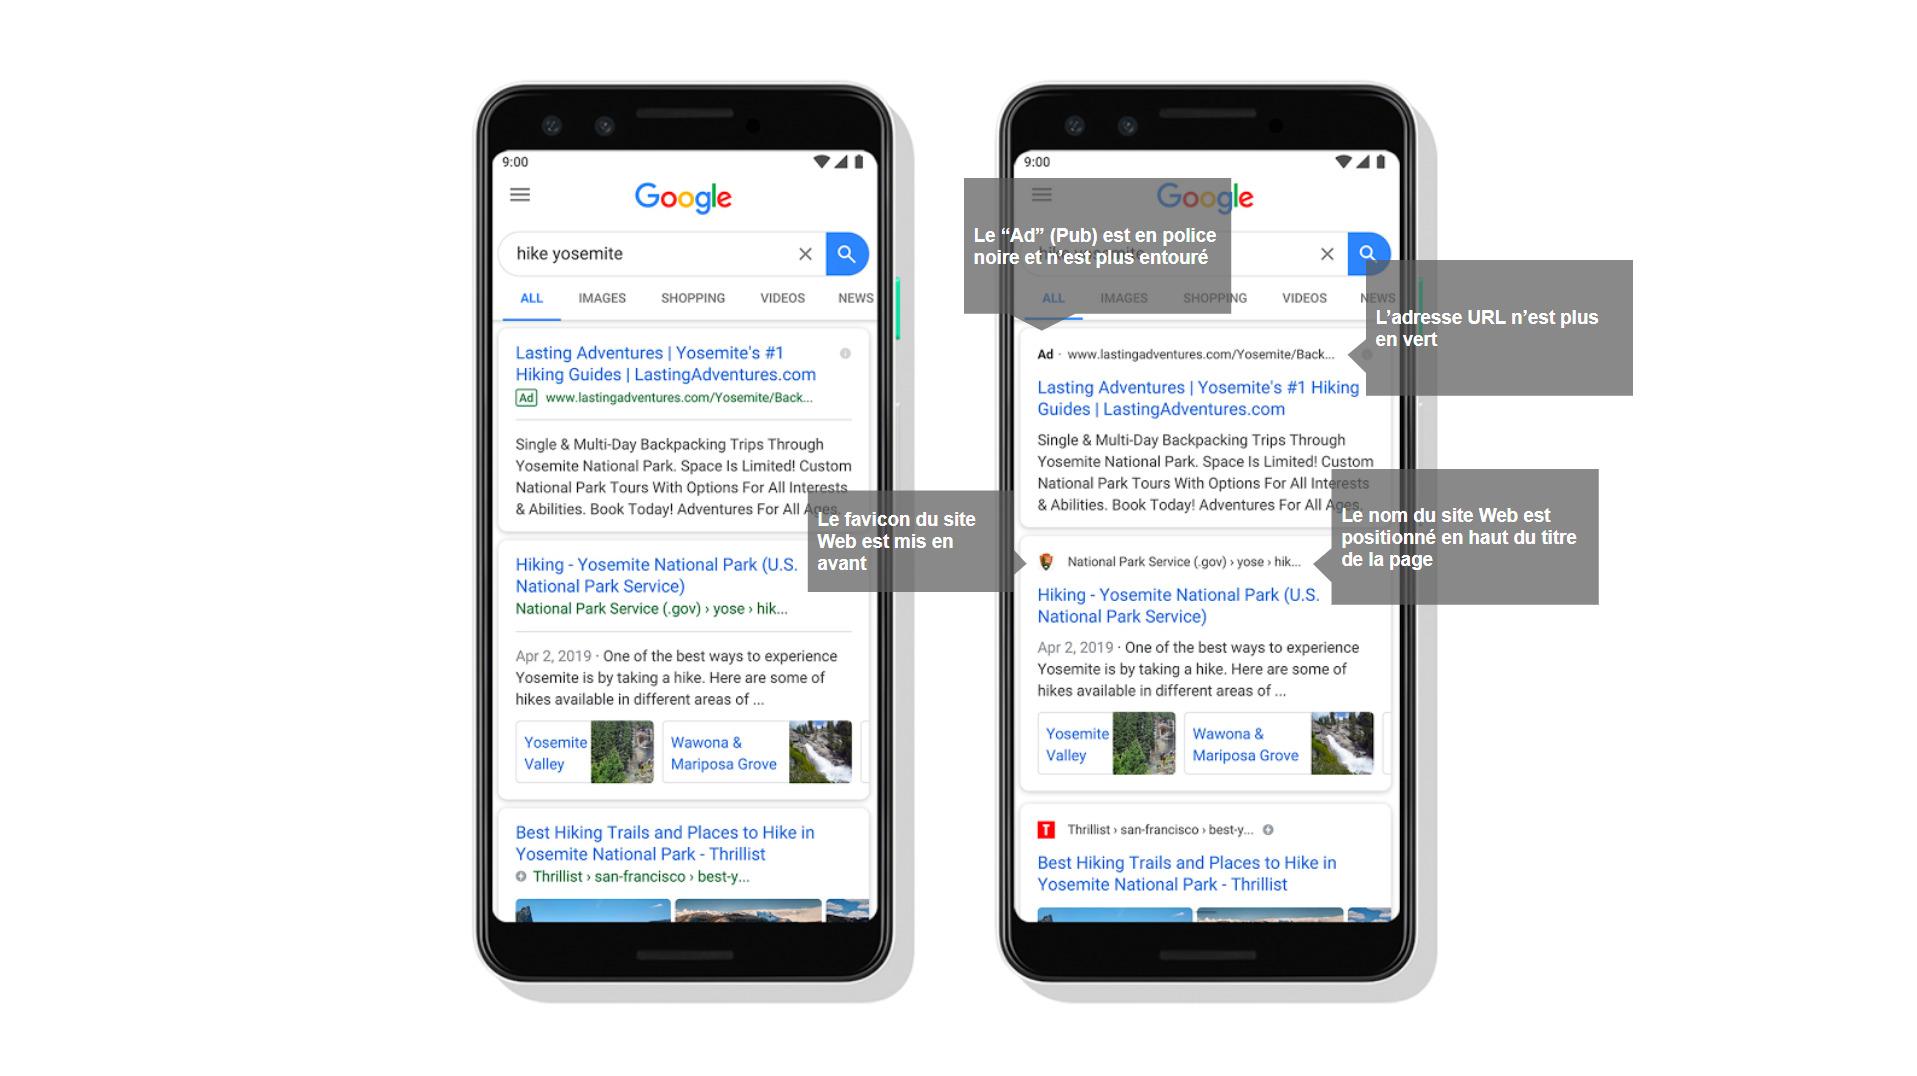 recherche google photo iphone